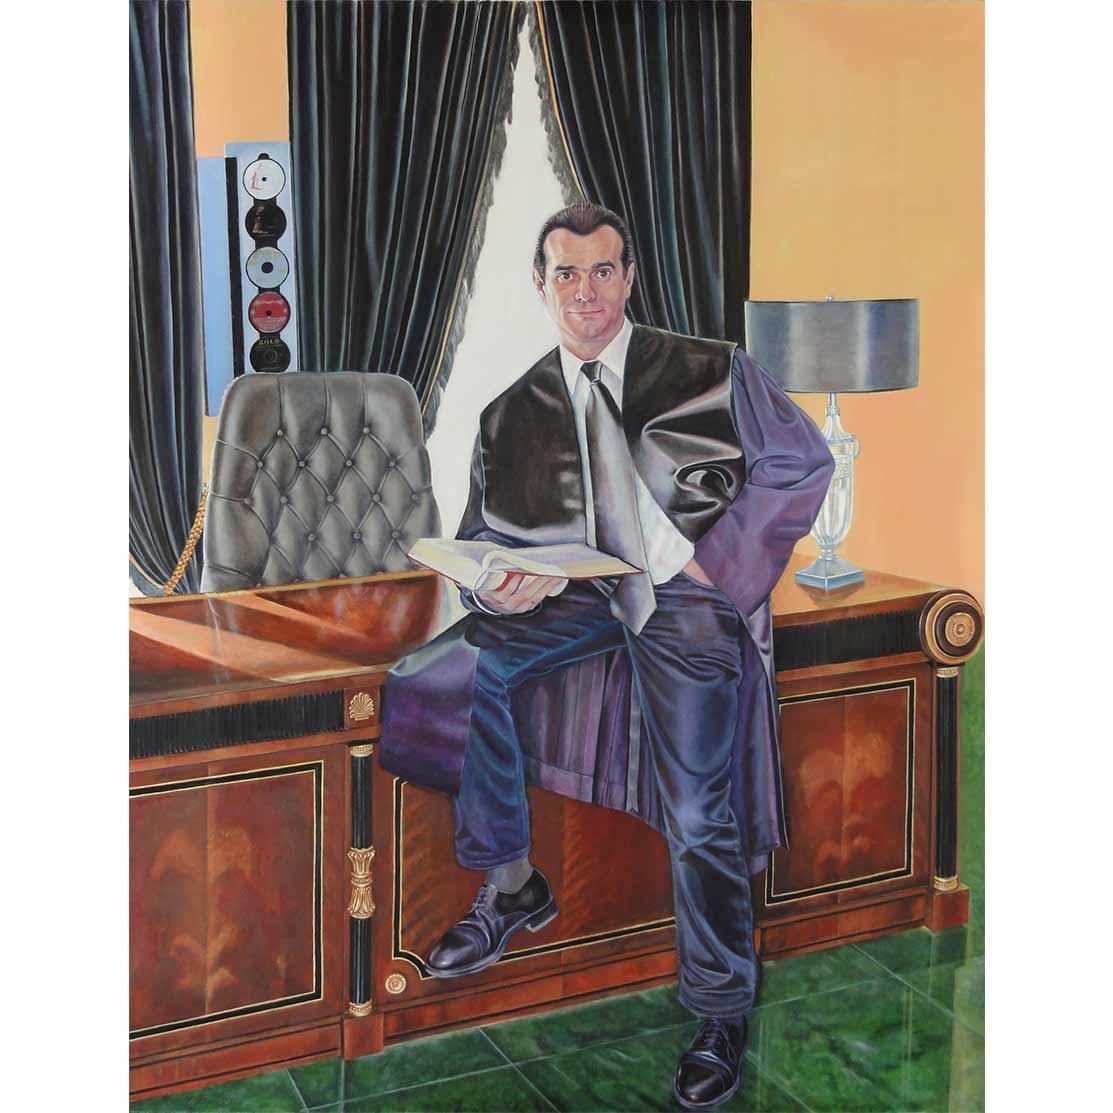 ÓSCAR, EL ABOGADOÓleo sobre lienzo 146 x 114 cm